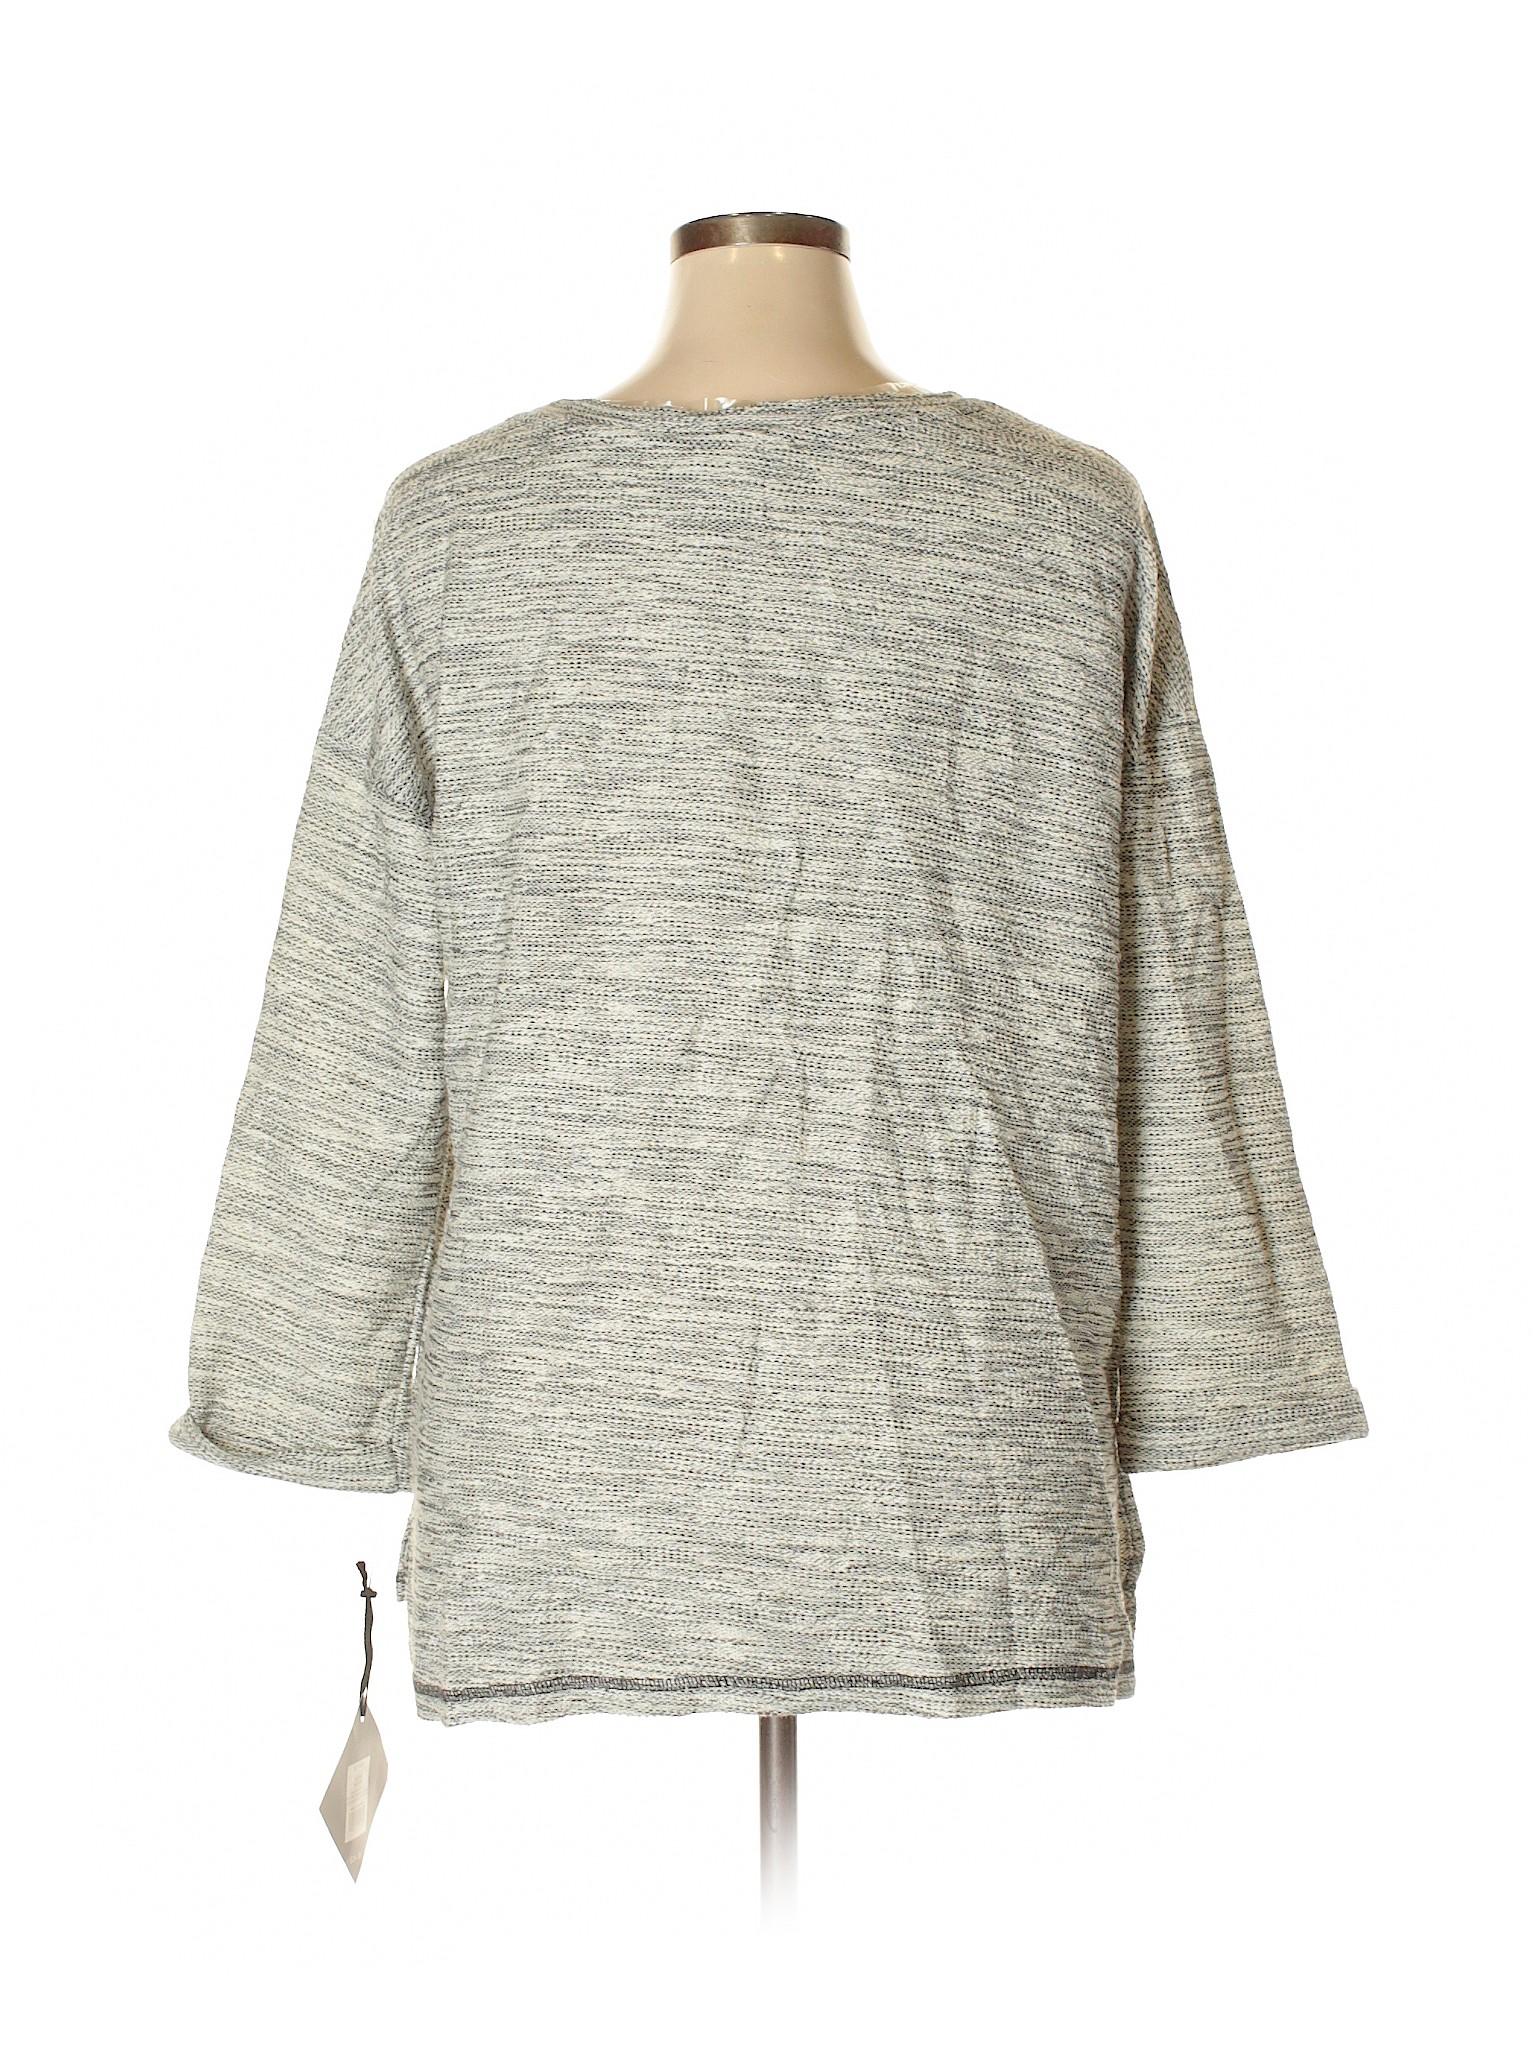 Boutique amp; Winter Ava Sweater Pullover Viv rrqEHd